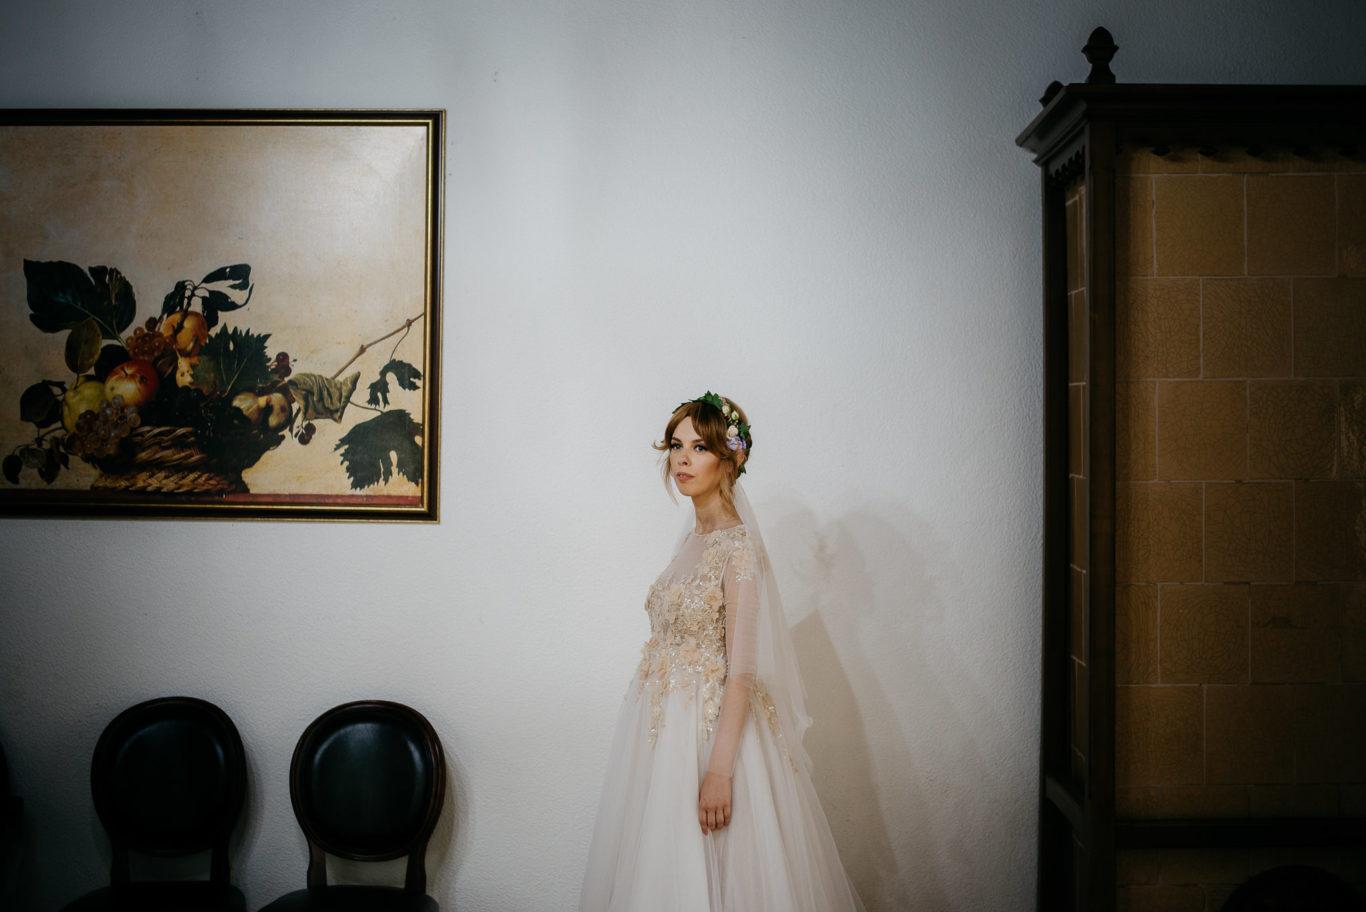 0156-Fotografie-nunta-Stirbey-Laura-Rares-fotograf-Ciprian-Dumitrescu-DSC_6406